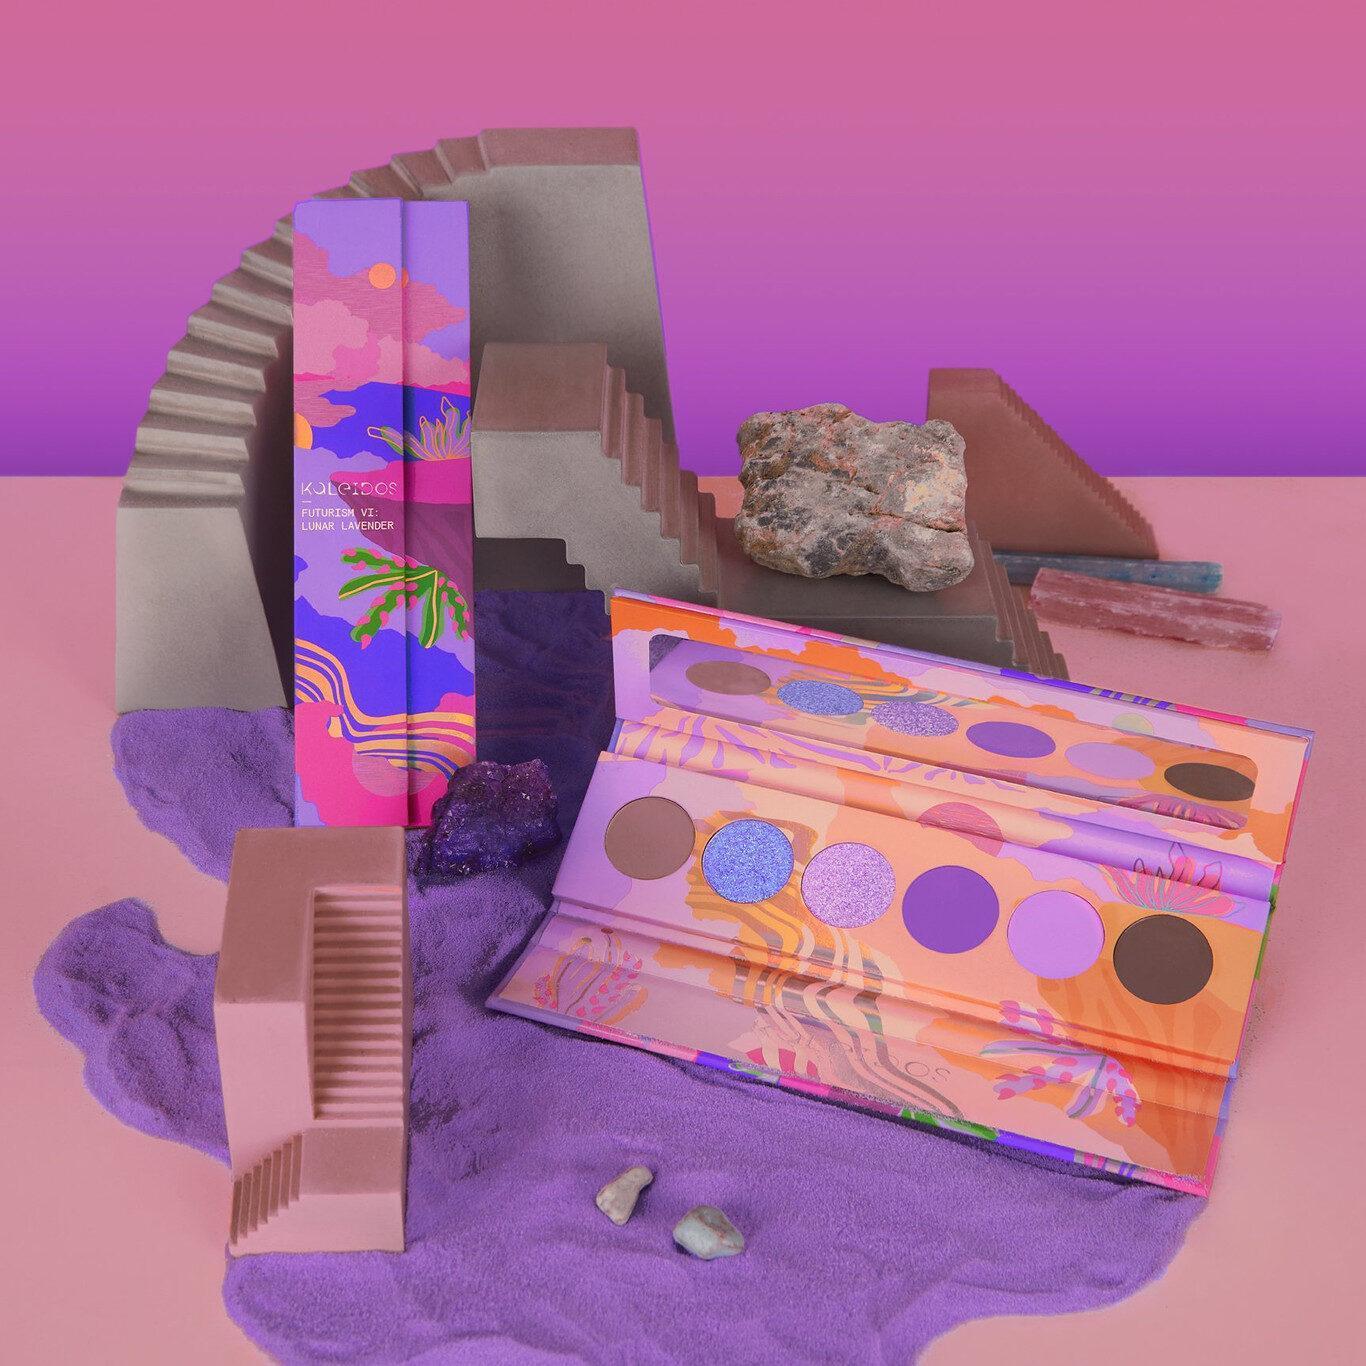 Kaleidos Makeup The Fresh Fantasy Collection Futurism VI Lunar Lavender Eyeshadow Palette Promo